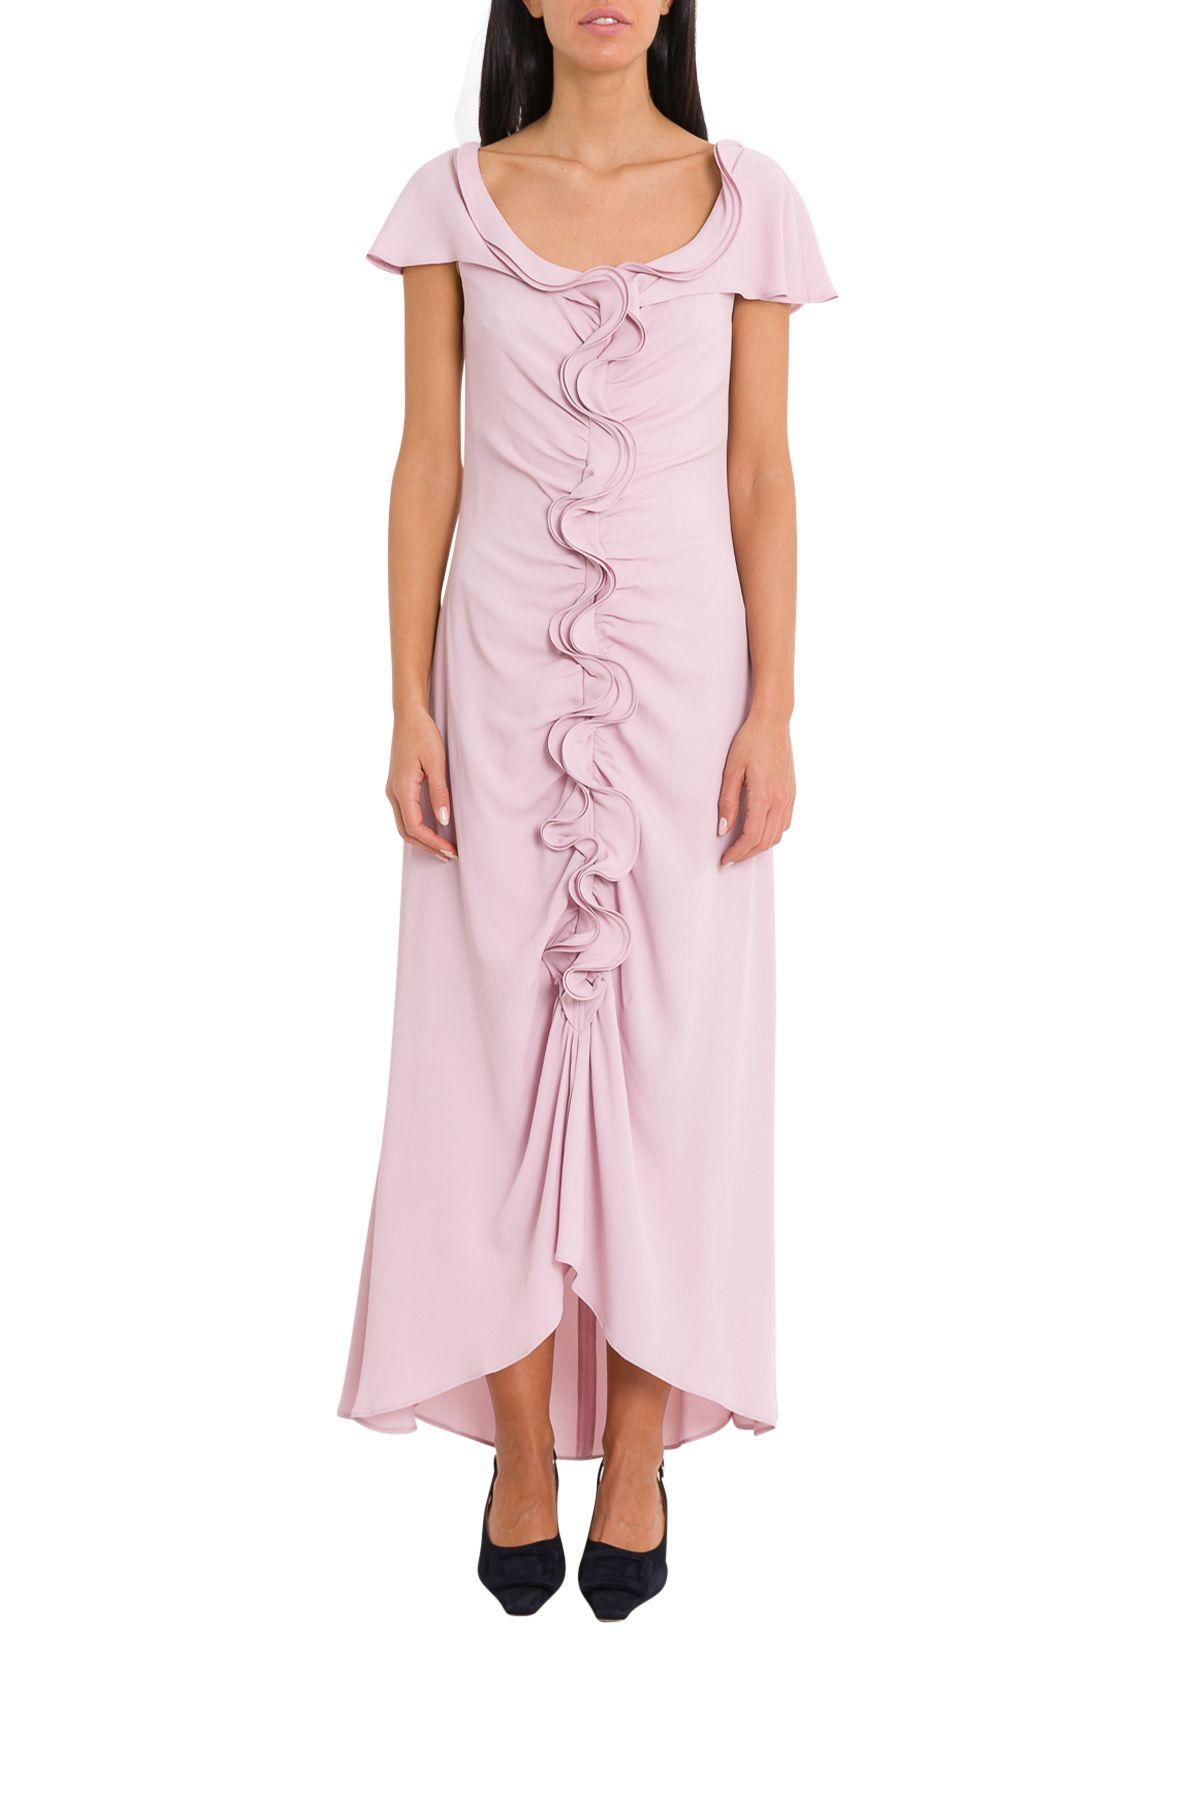 Sies Marjan Portia Marocaine Center Ruched Dress